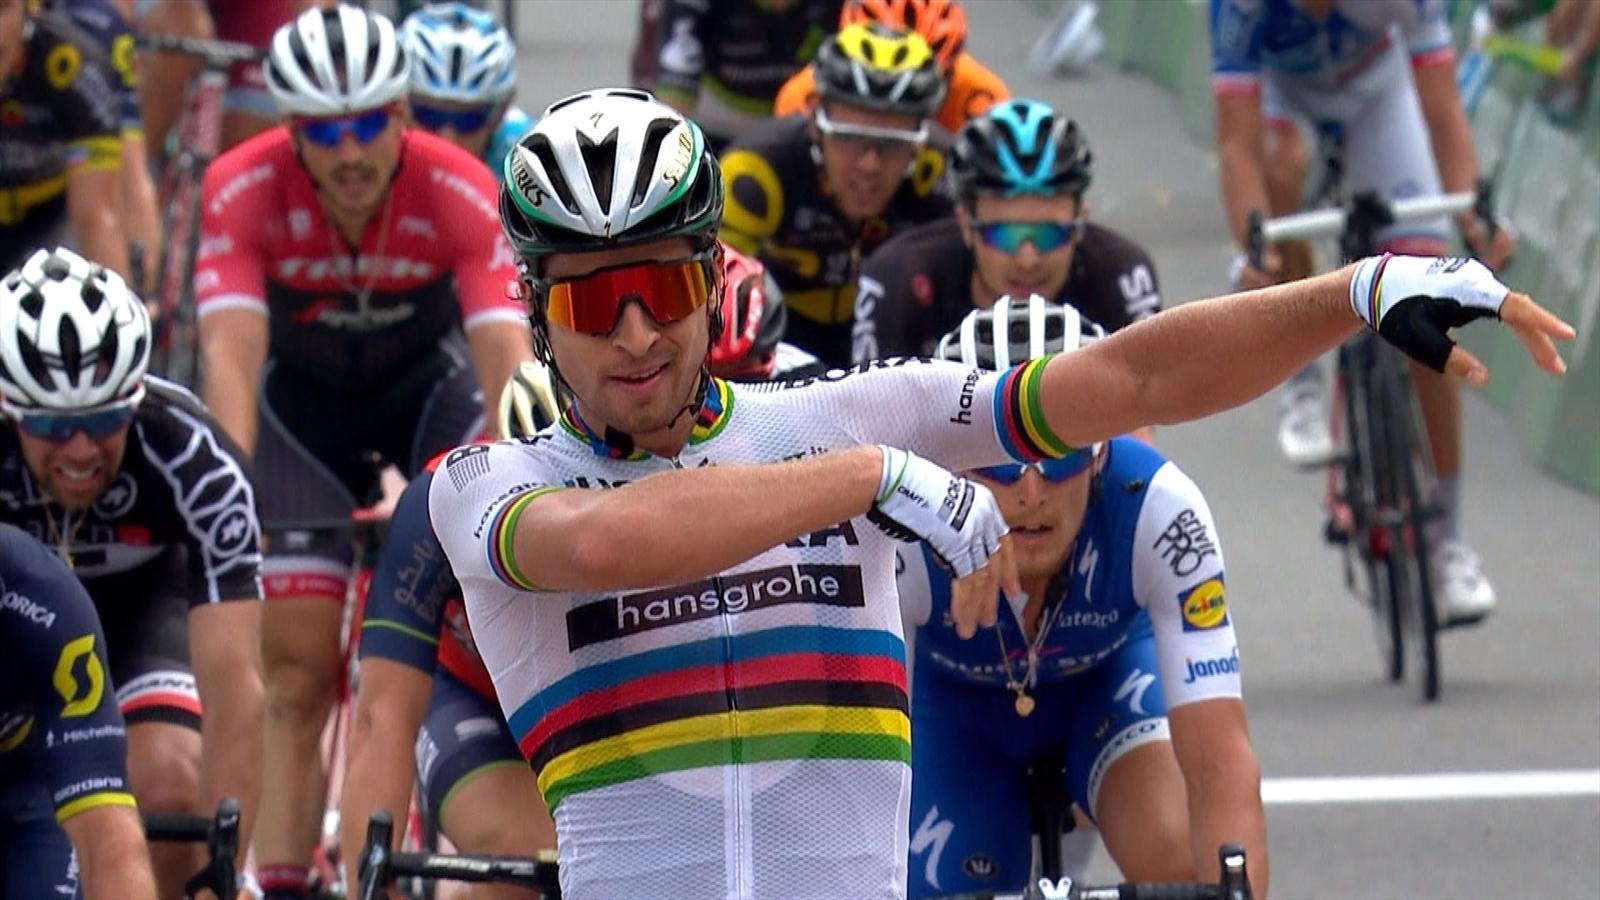 VIDEO - Tour de Suisse: Peter Sagan celebrates Stage 5 win in style - Video Eurosport UK